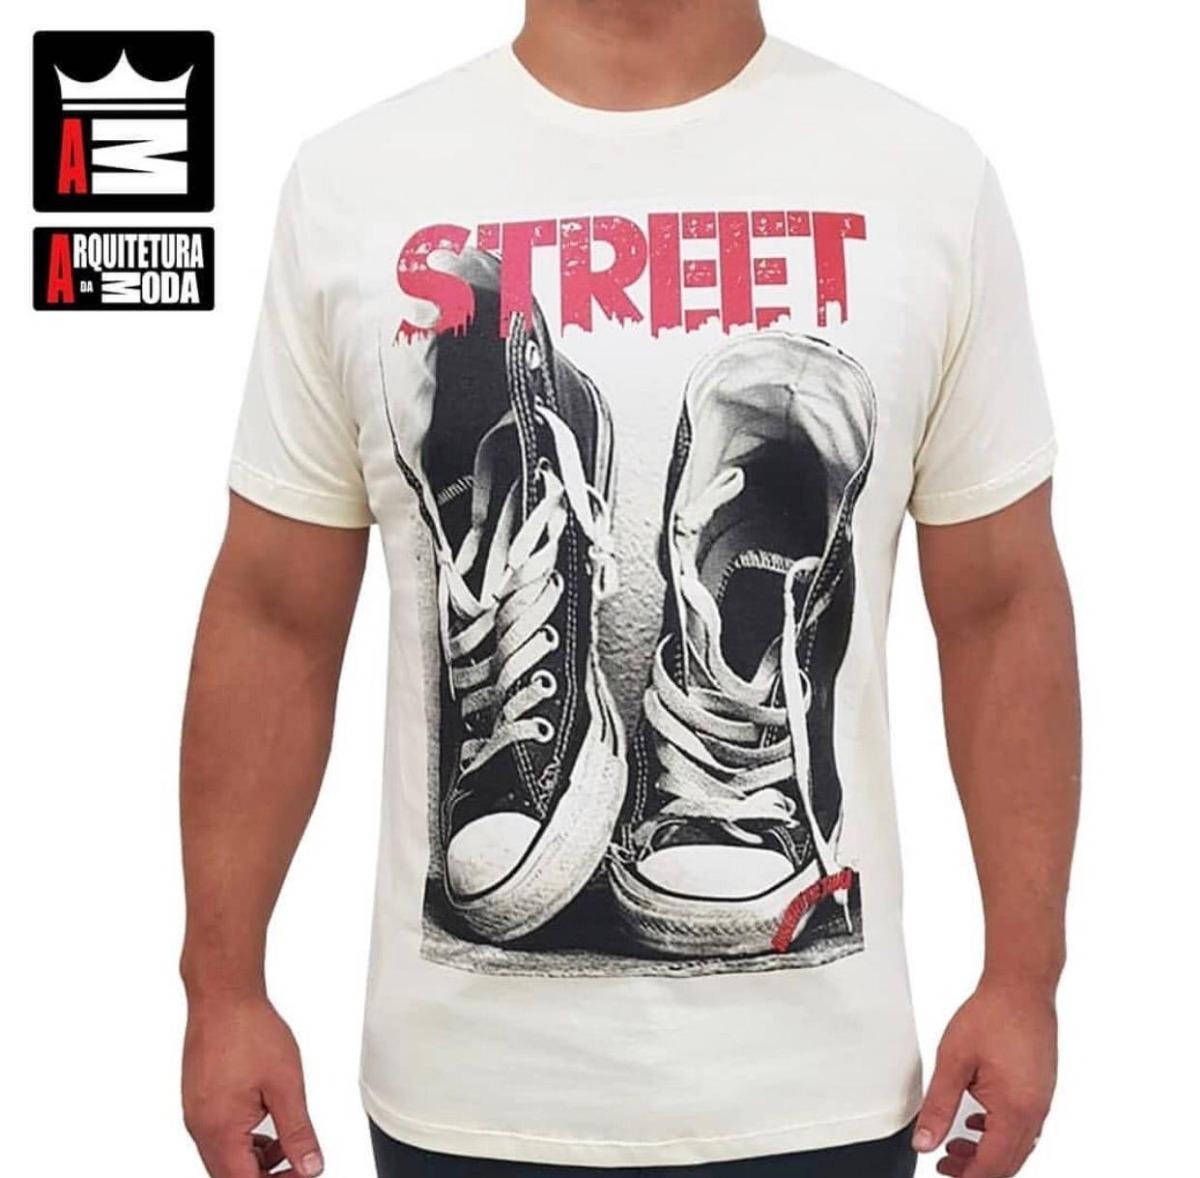 camiseta masculina arquitetura da moda estilo alternativo. Carregando zoom. dd6ad8ca39299